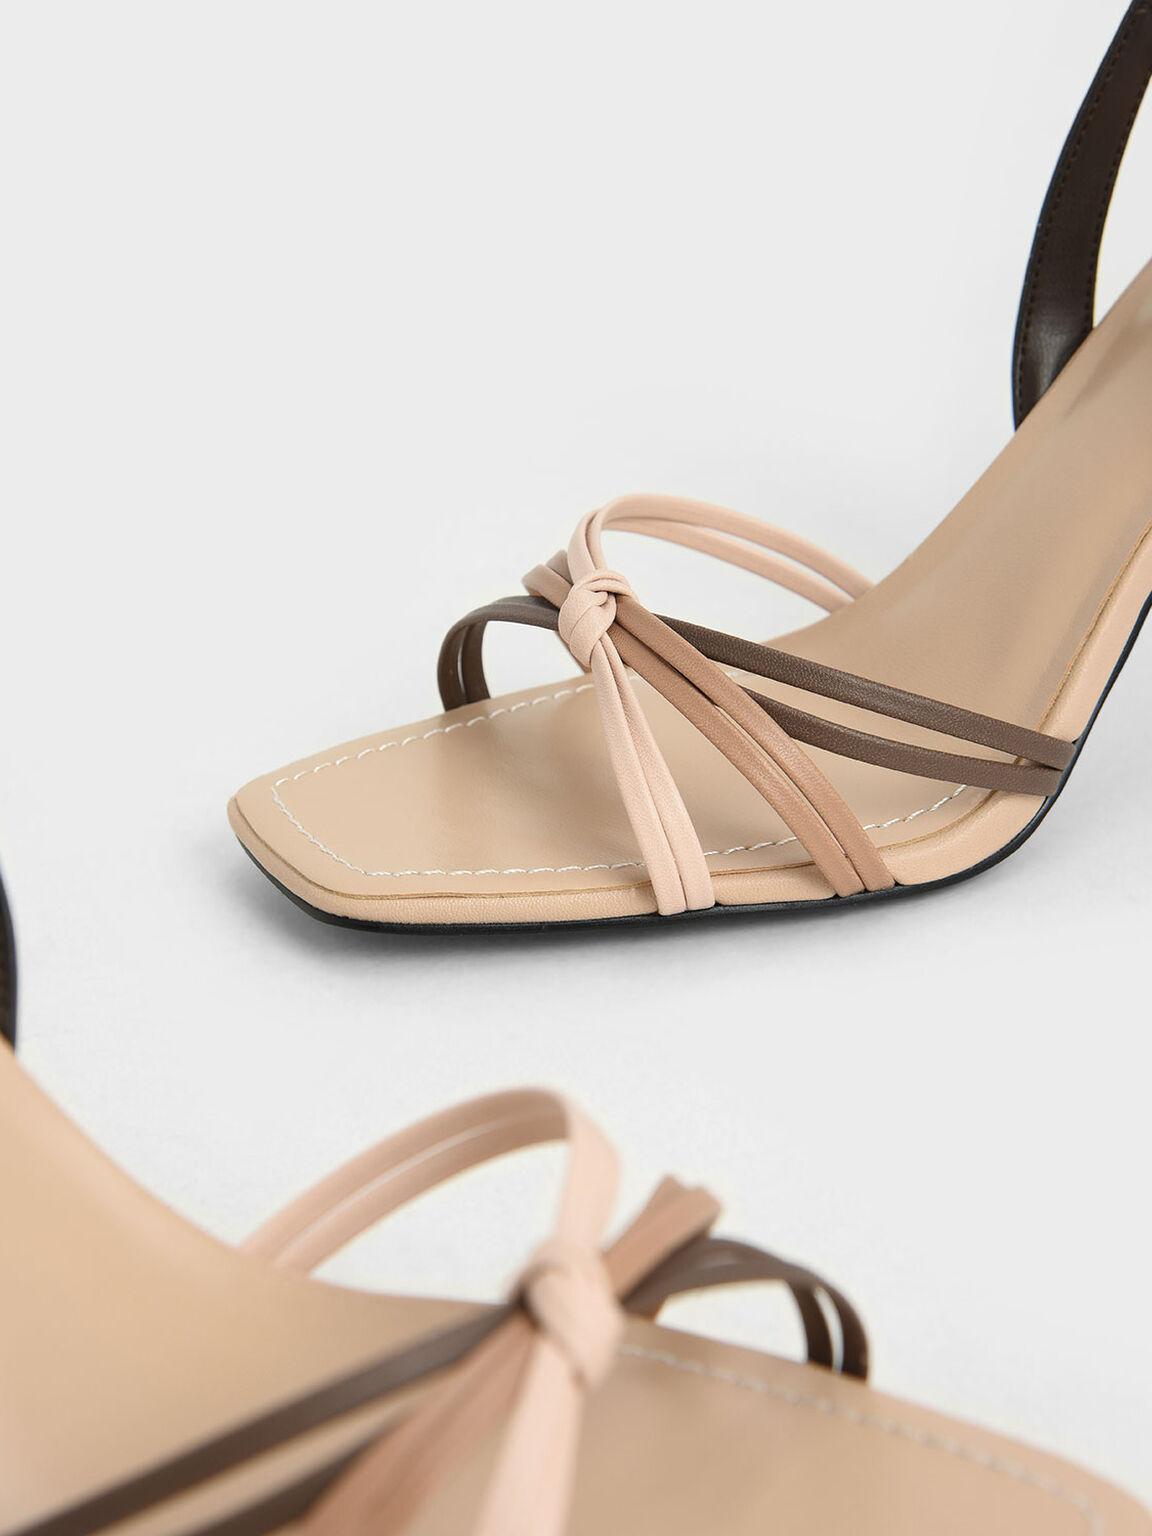 Strappy Slingback Heeled Sandals, Nude, hi-res